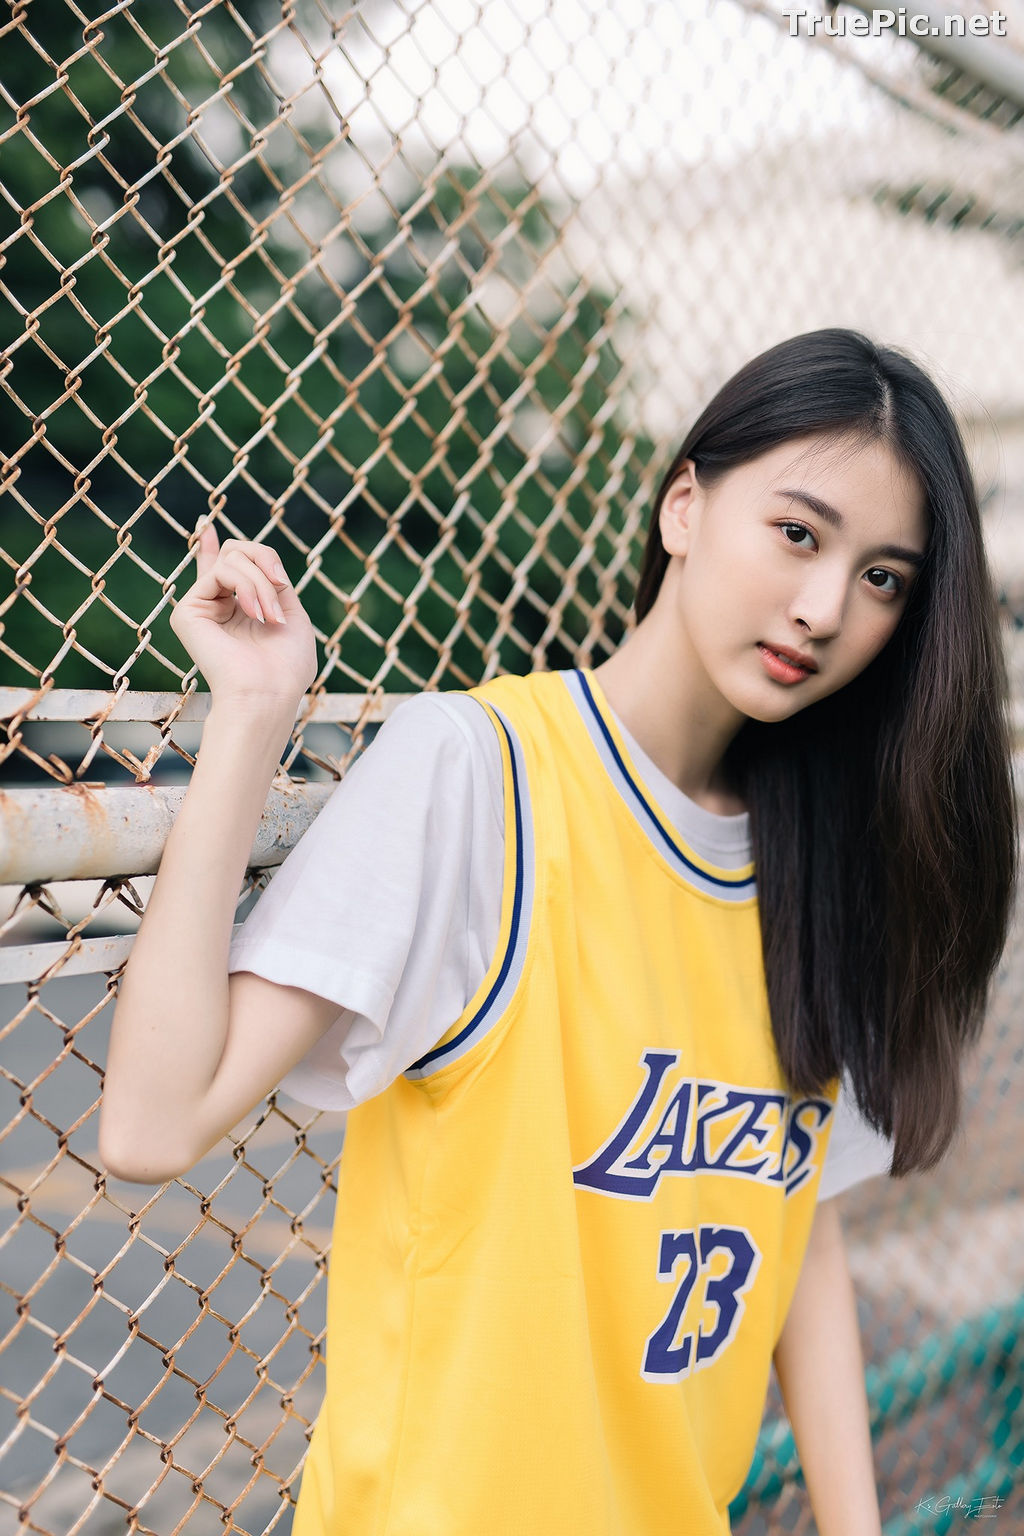 Image Thailand Beautiful Girl - View Benyapa - Long Hair Sport Girl - TruePic.net - Picture-5